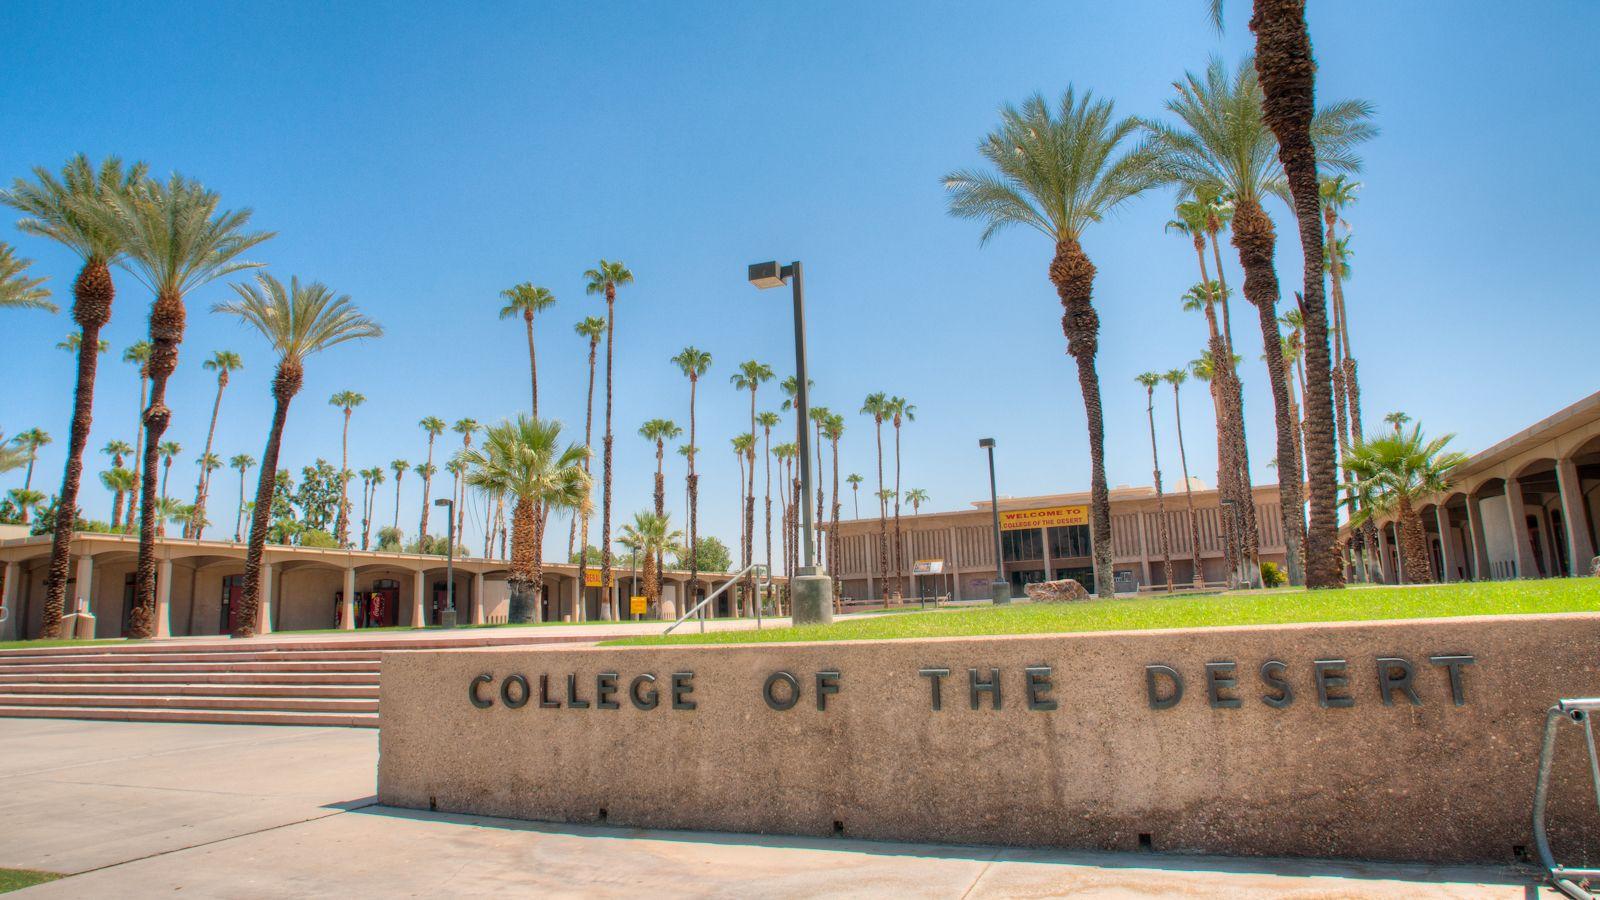 Designed By Rsm Design Architectural Environmental Graphic Design Monumental Signage S Environmental Graphic Design Palm Springs Architecture Campus Design